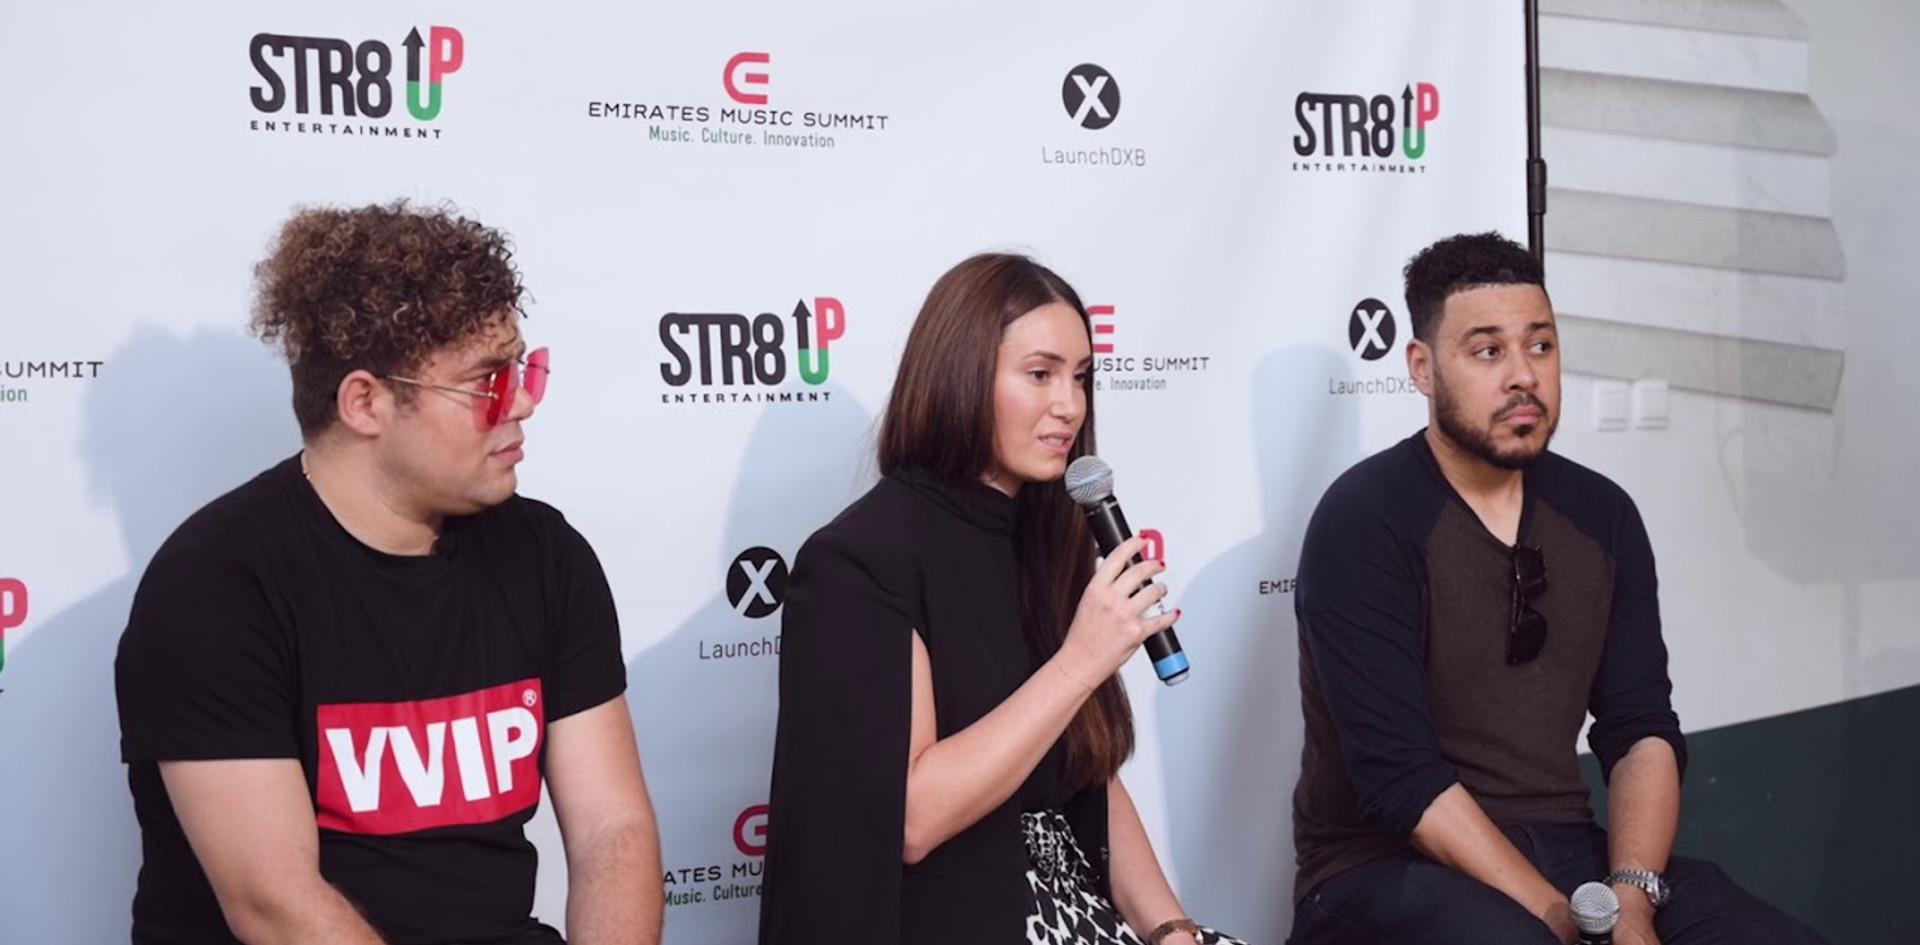 Emirates Music Summit (Behind the scenes)